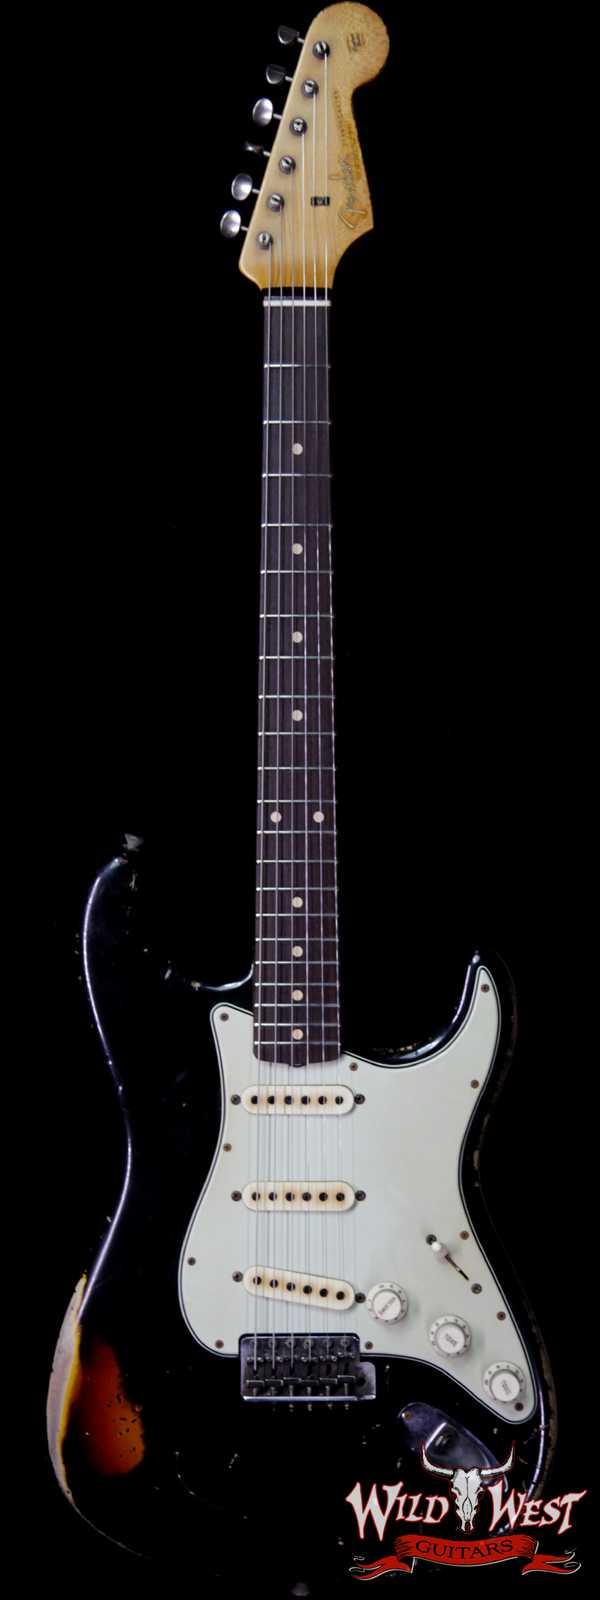 Fender Custom Shop John Cruz Masterbuilt 1961 Stratocaster Heavy Relic AAA Rosewood Slab Board Black / 3 Tone Sunburst